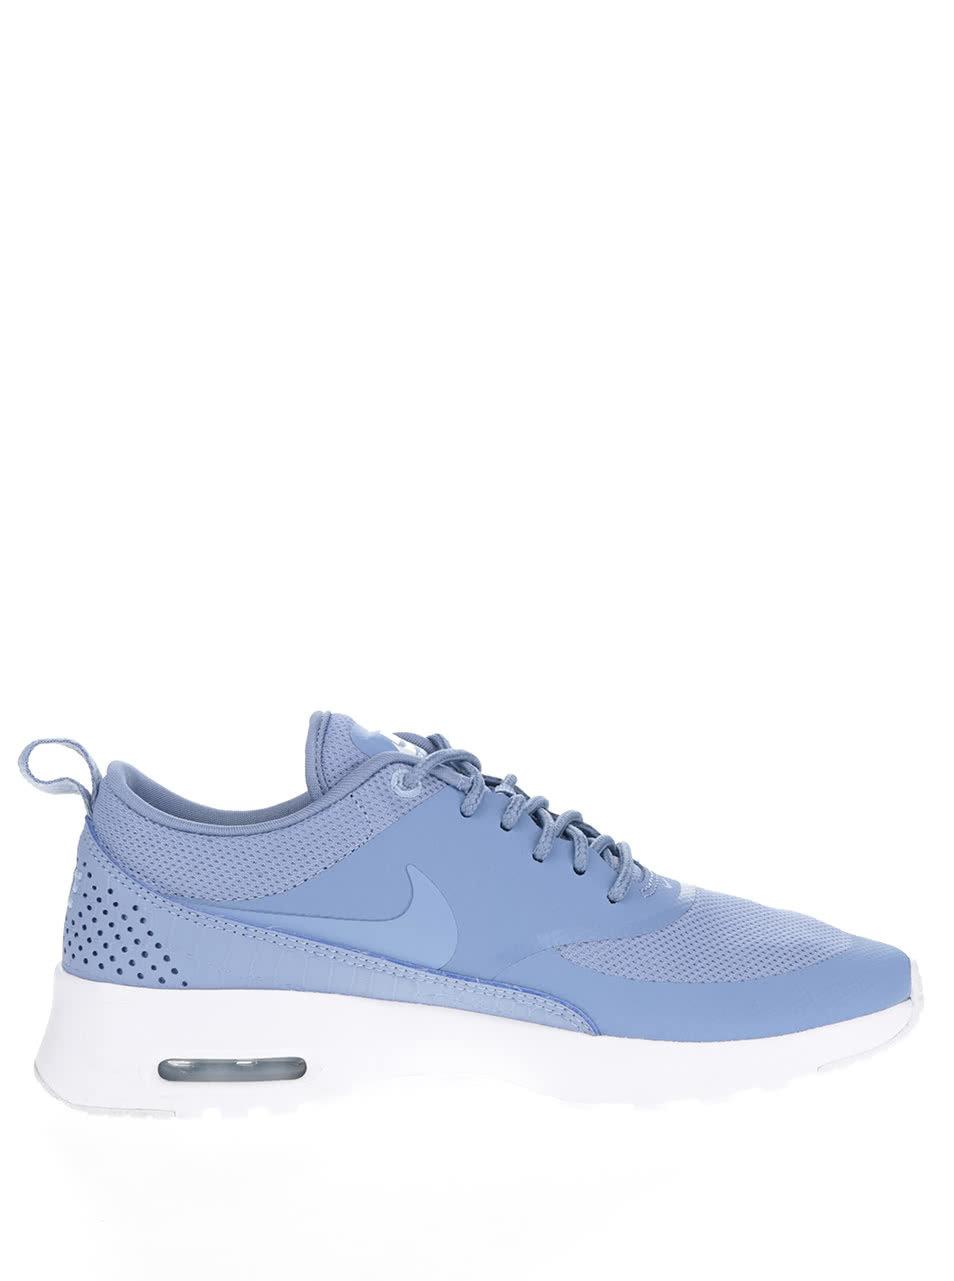 Světle modré dámské tenisky Nike Air Max Thea ... ea1fc52409